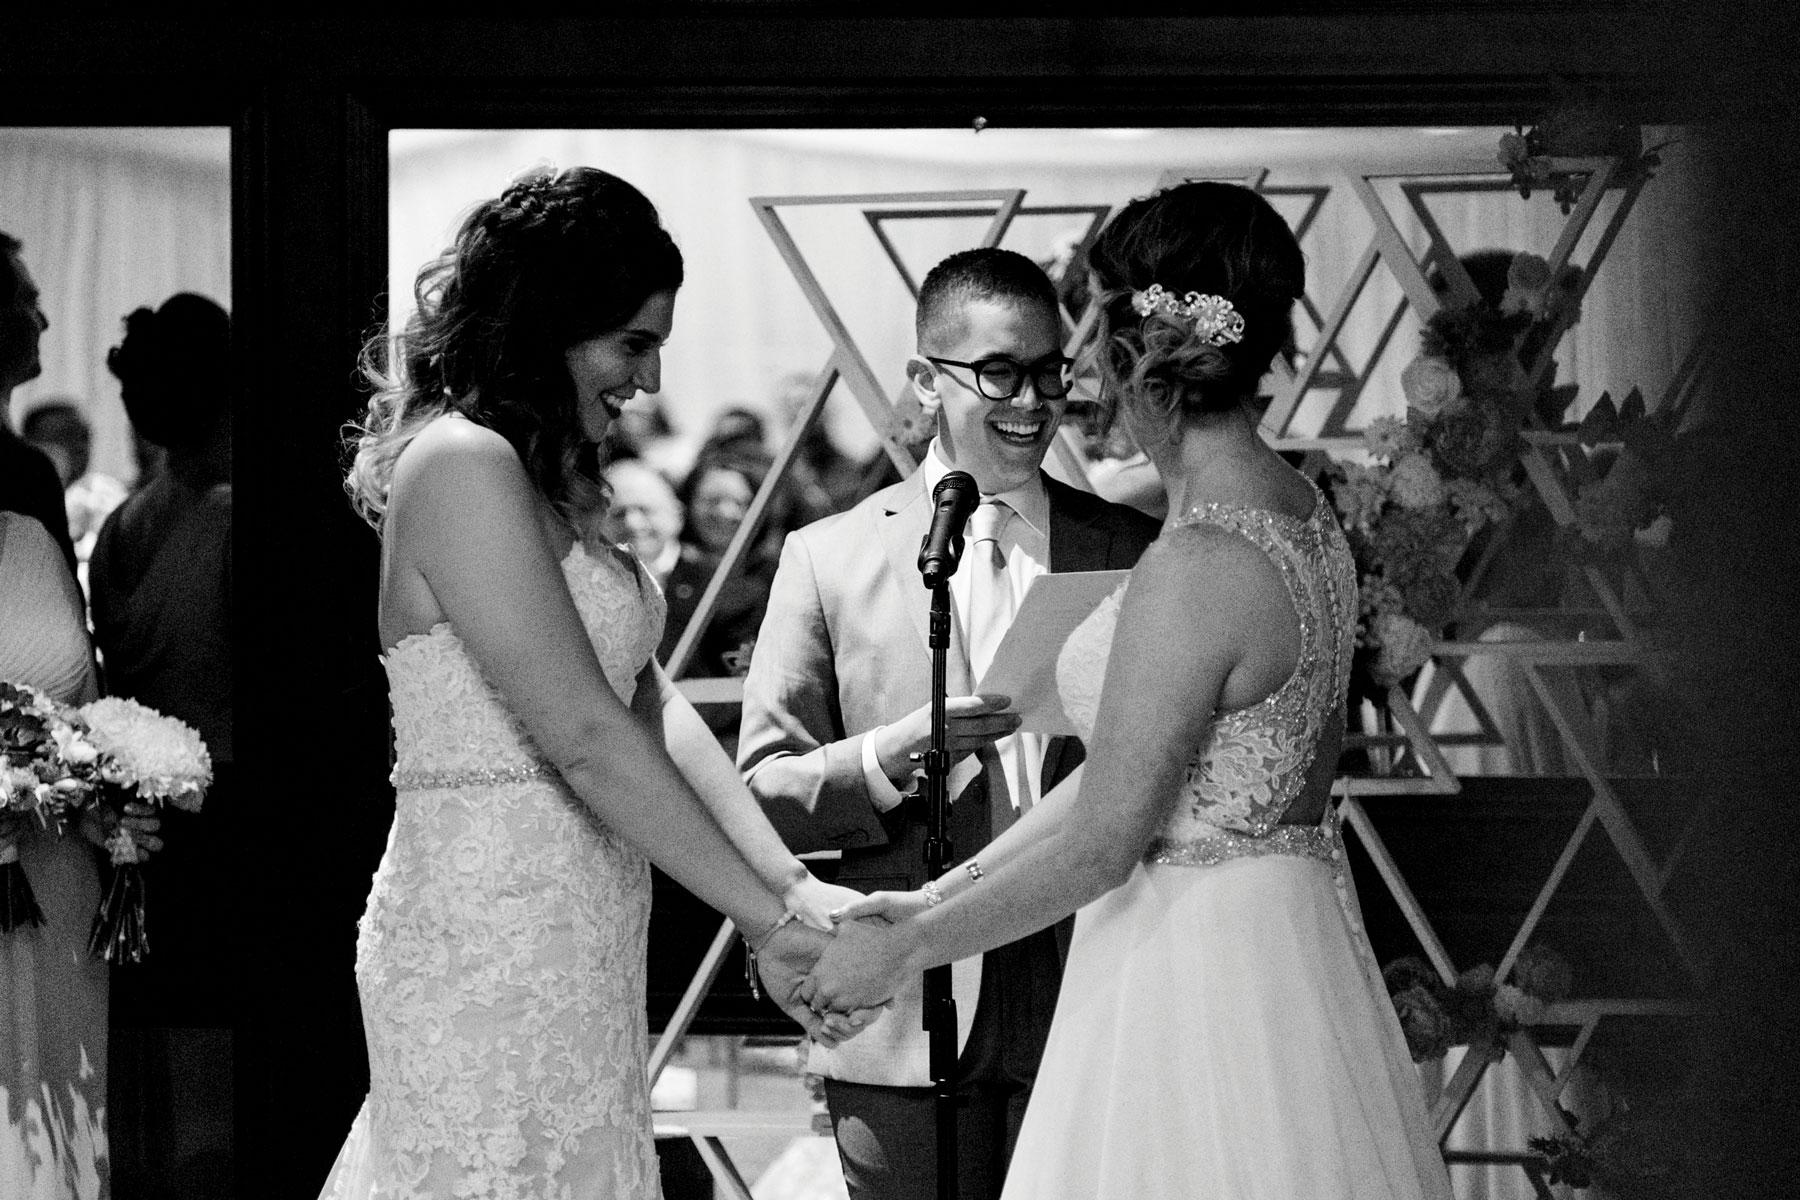 LeeAnn+Chris_Wedding-449.jpg